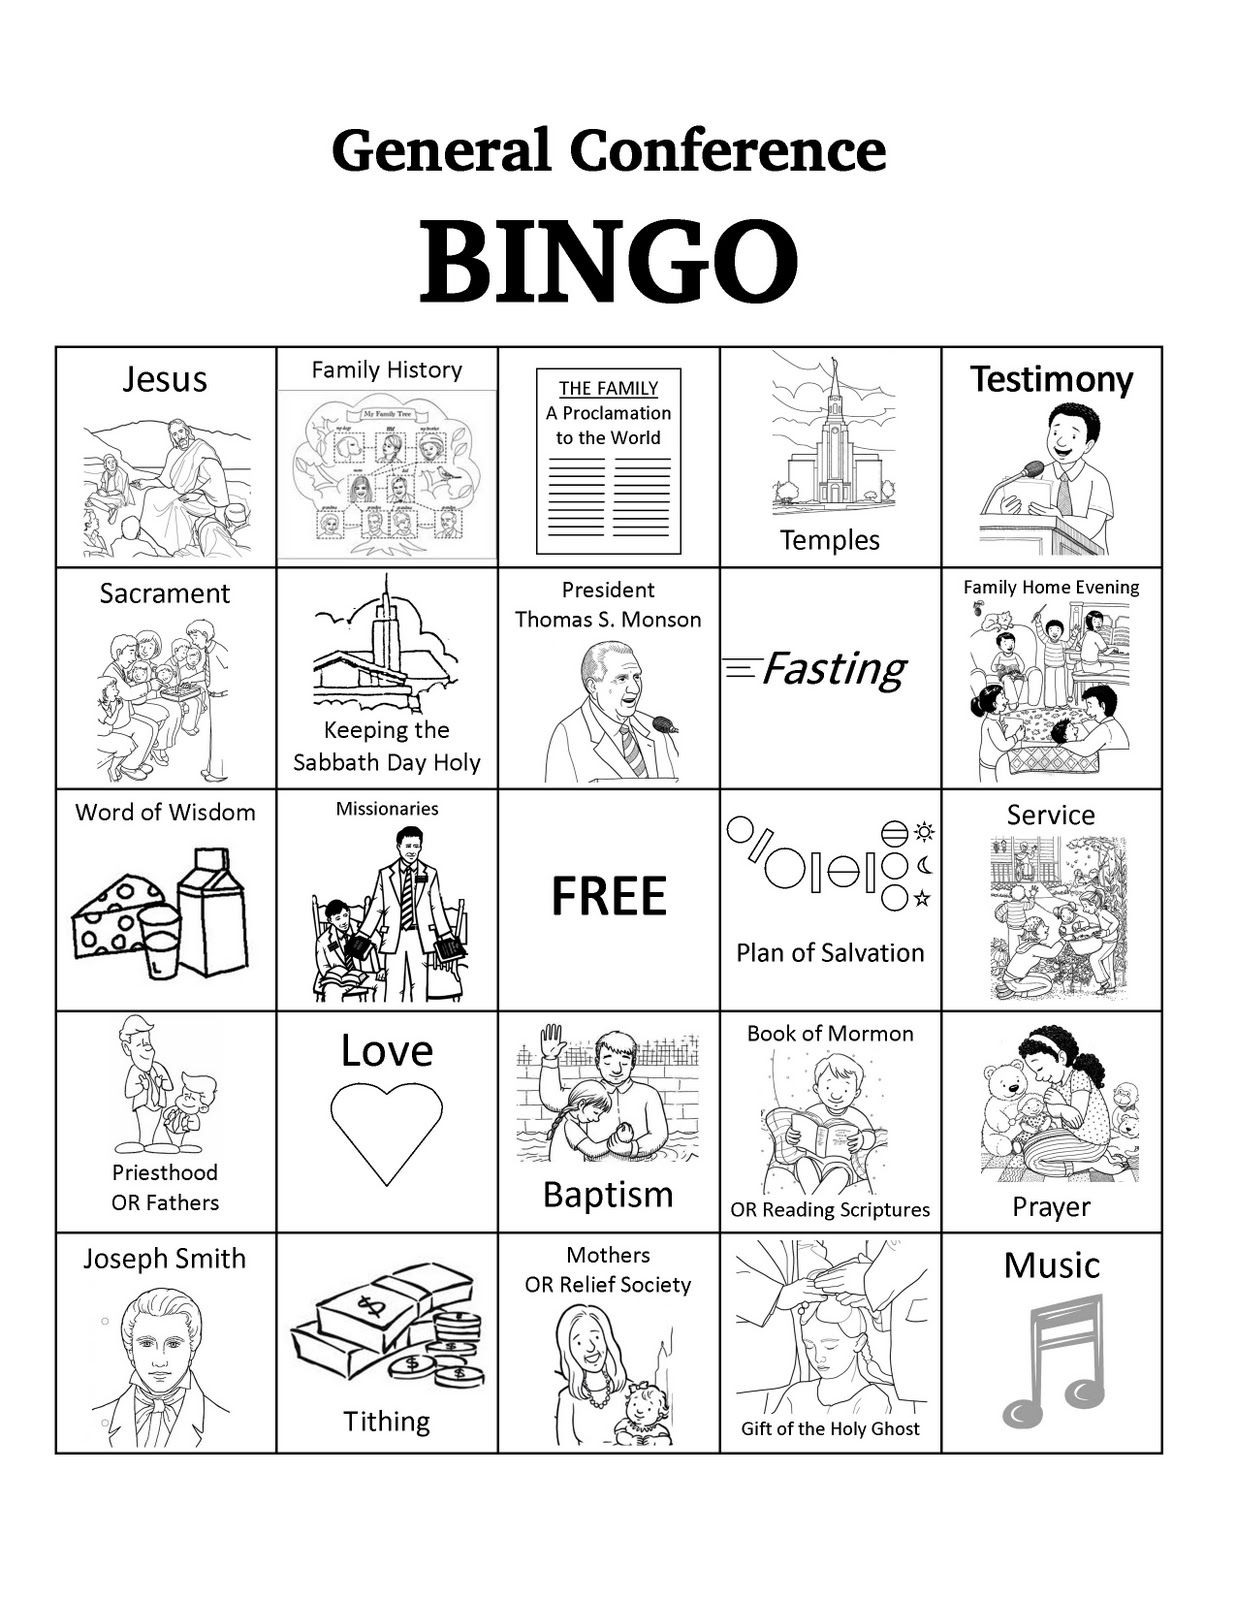 Free Download General Conference Bingo